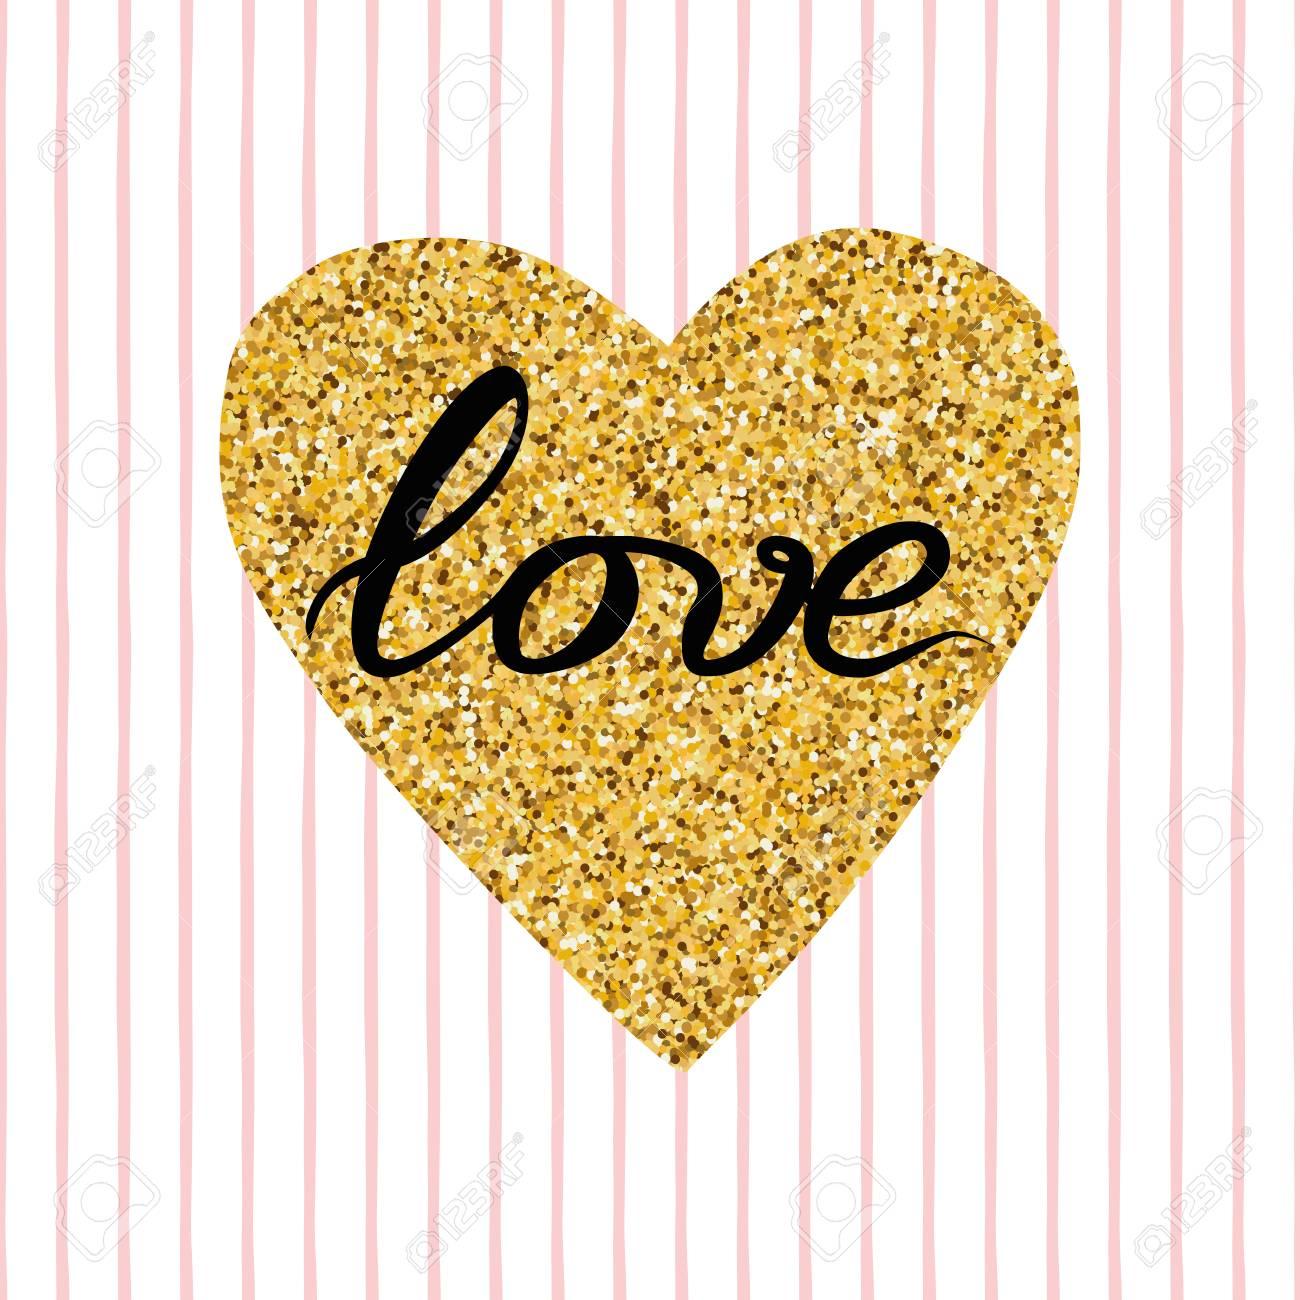 Mano Dibujada Moderna Forma De Corazon De Oro Brillo Frase Amor En